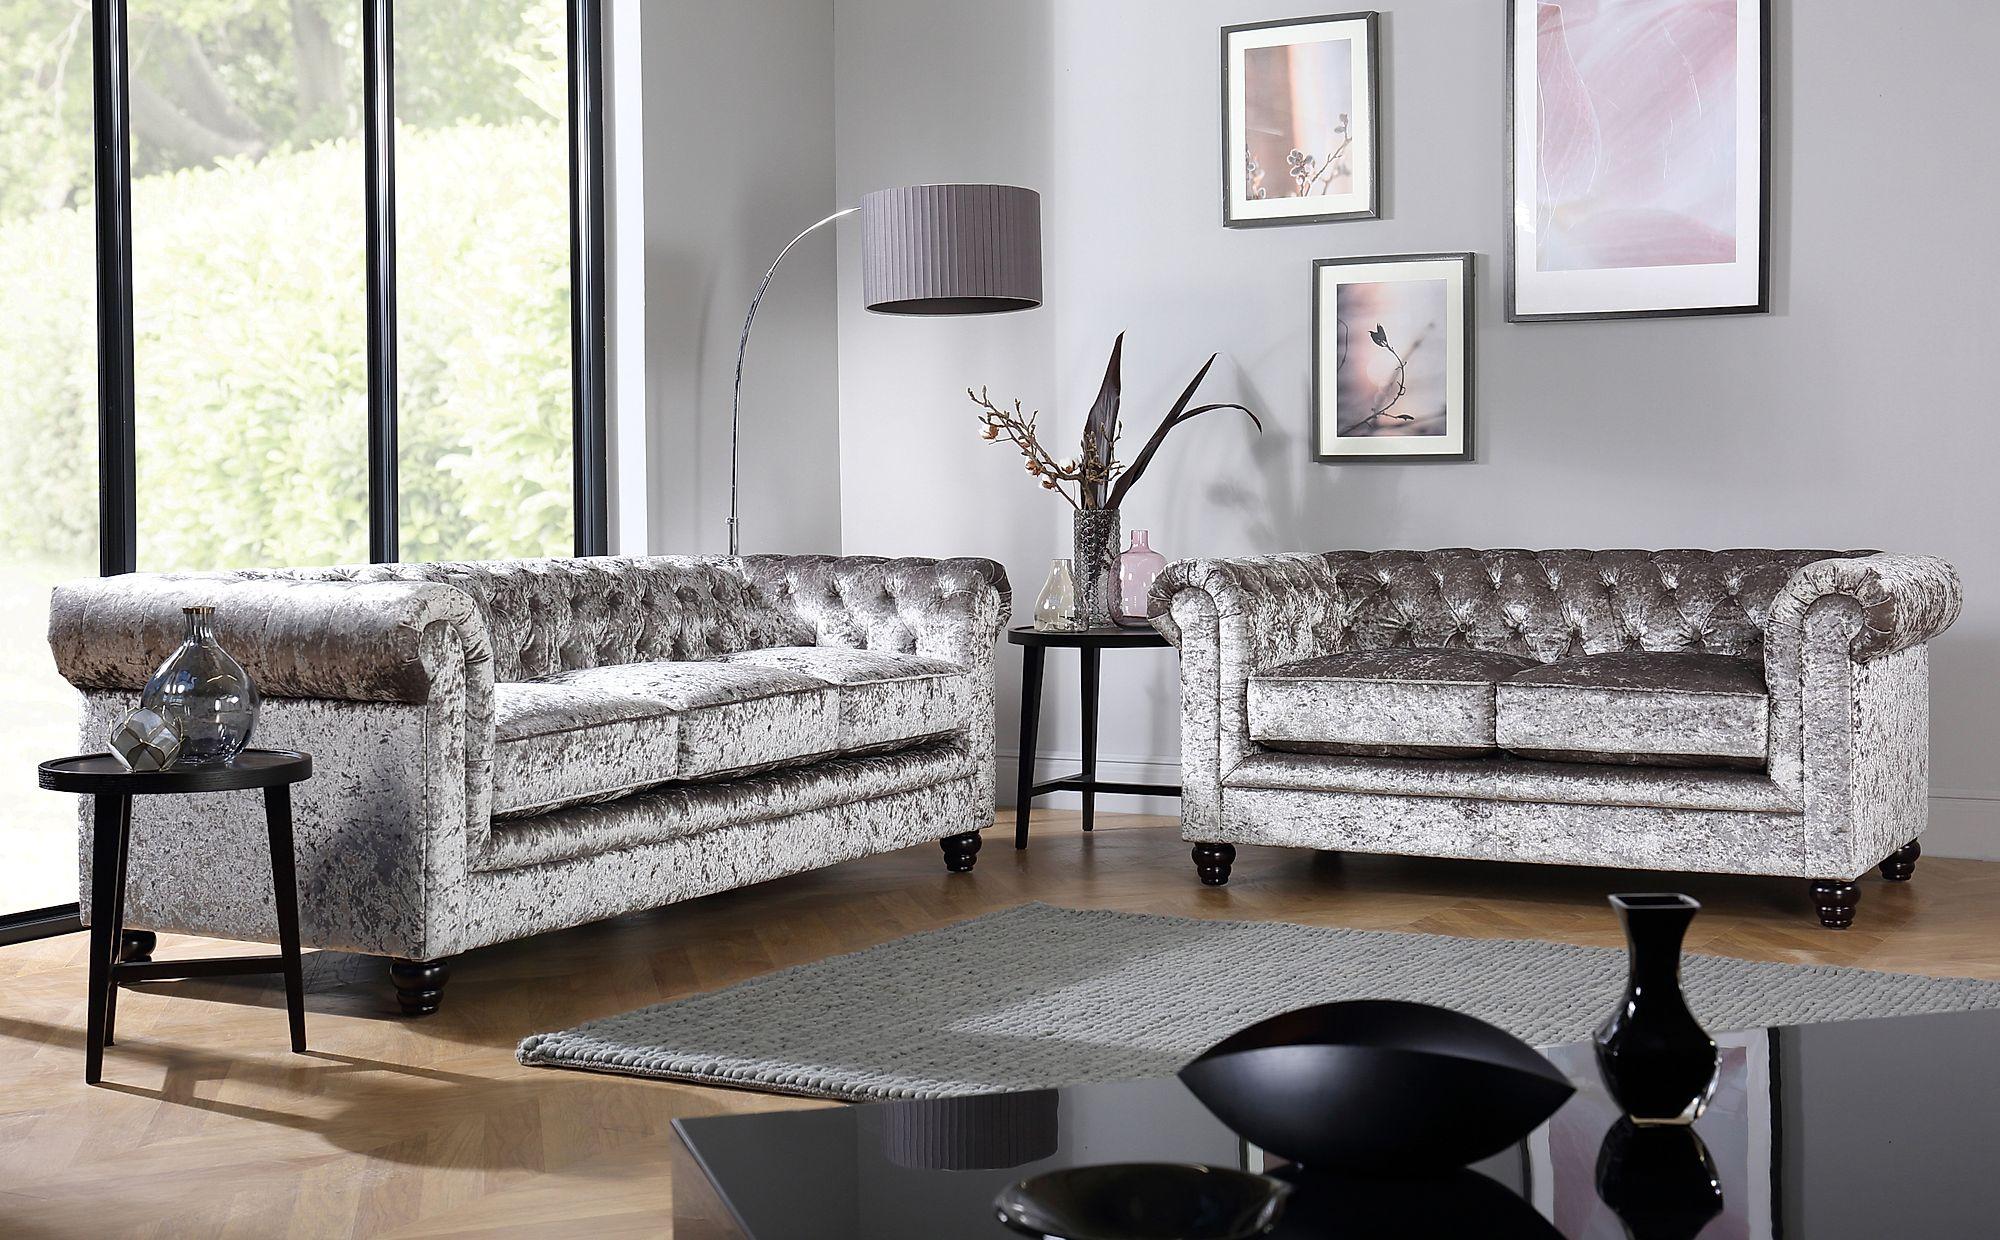 Hampton Silver Crushed Velvet Chesterfield Sofa - 3+2 Seater